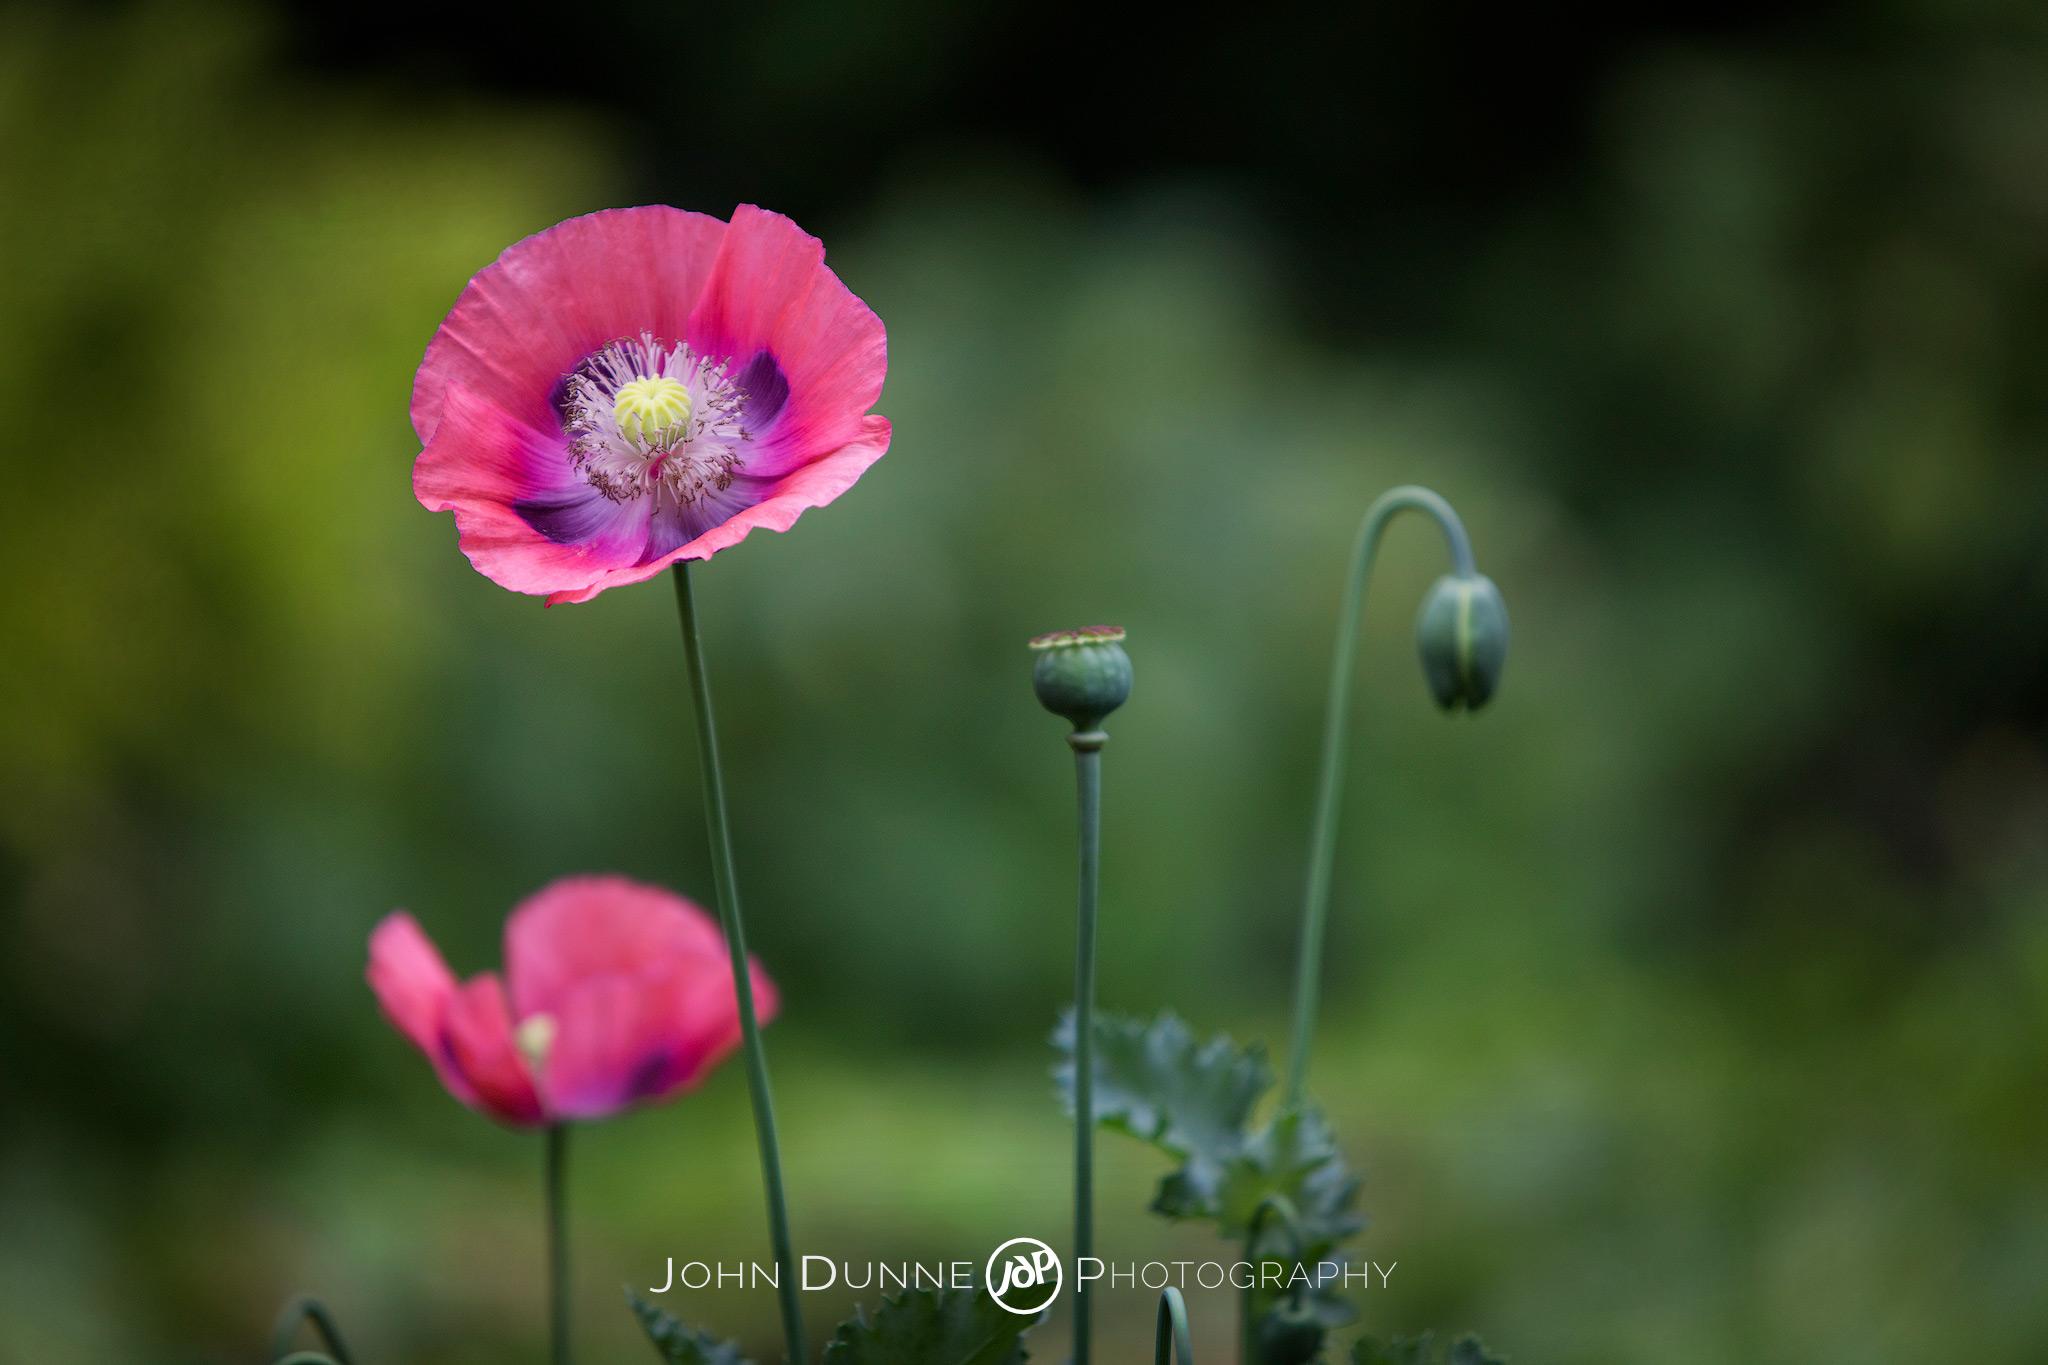 Flourish by John Dunne.